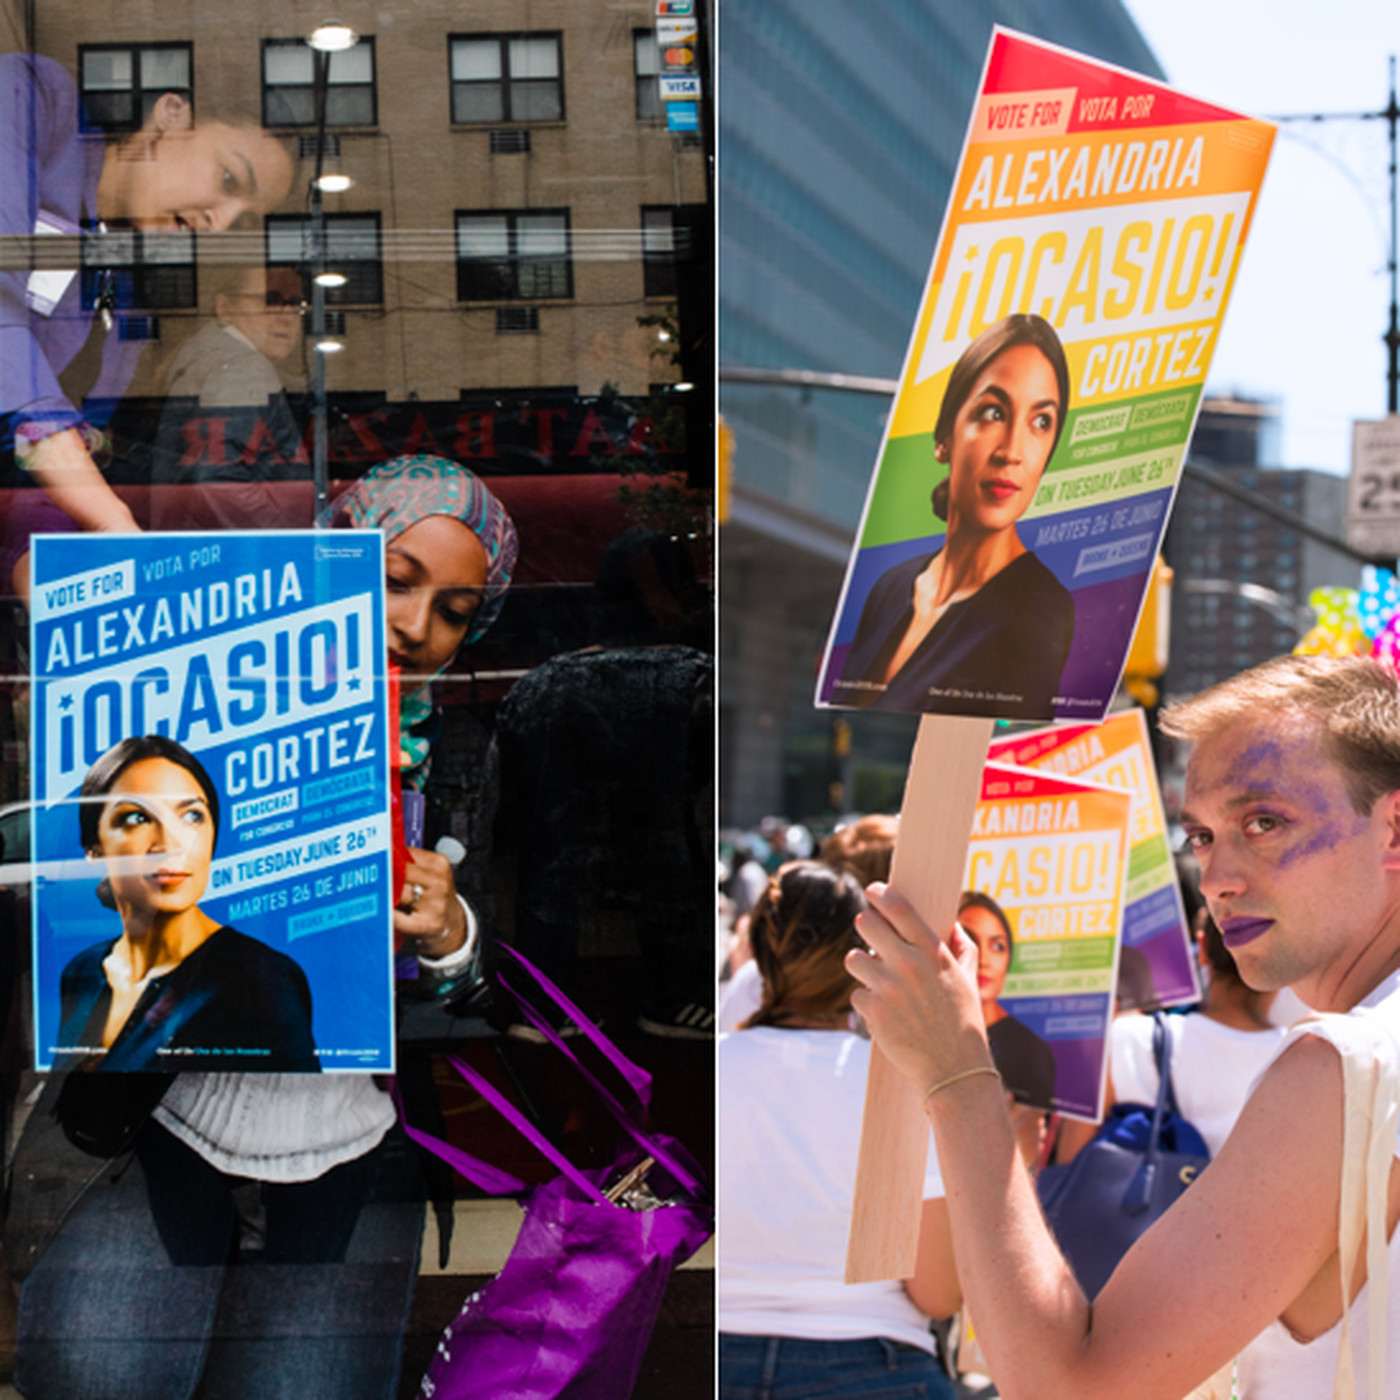 Alexandria Ocasio Cortezs Campaign Design Was A Big Bold Winning Bet Vox